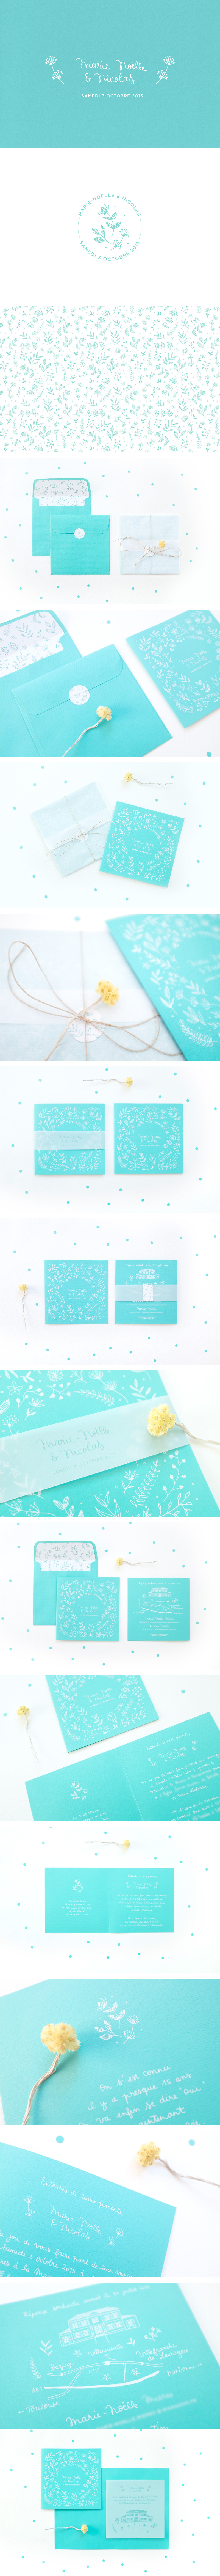 Chic-boho-custom-illustrated-wedding-invitation